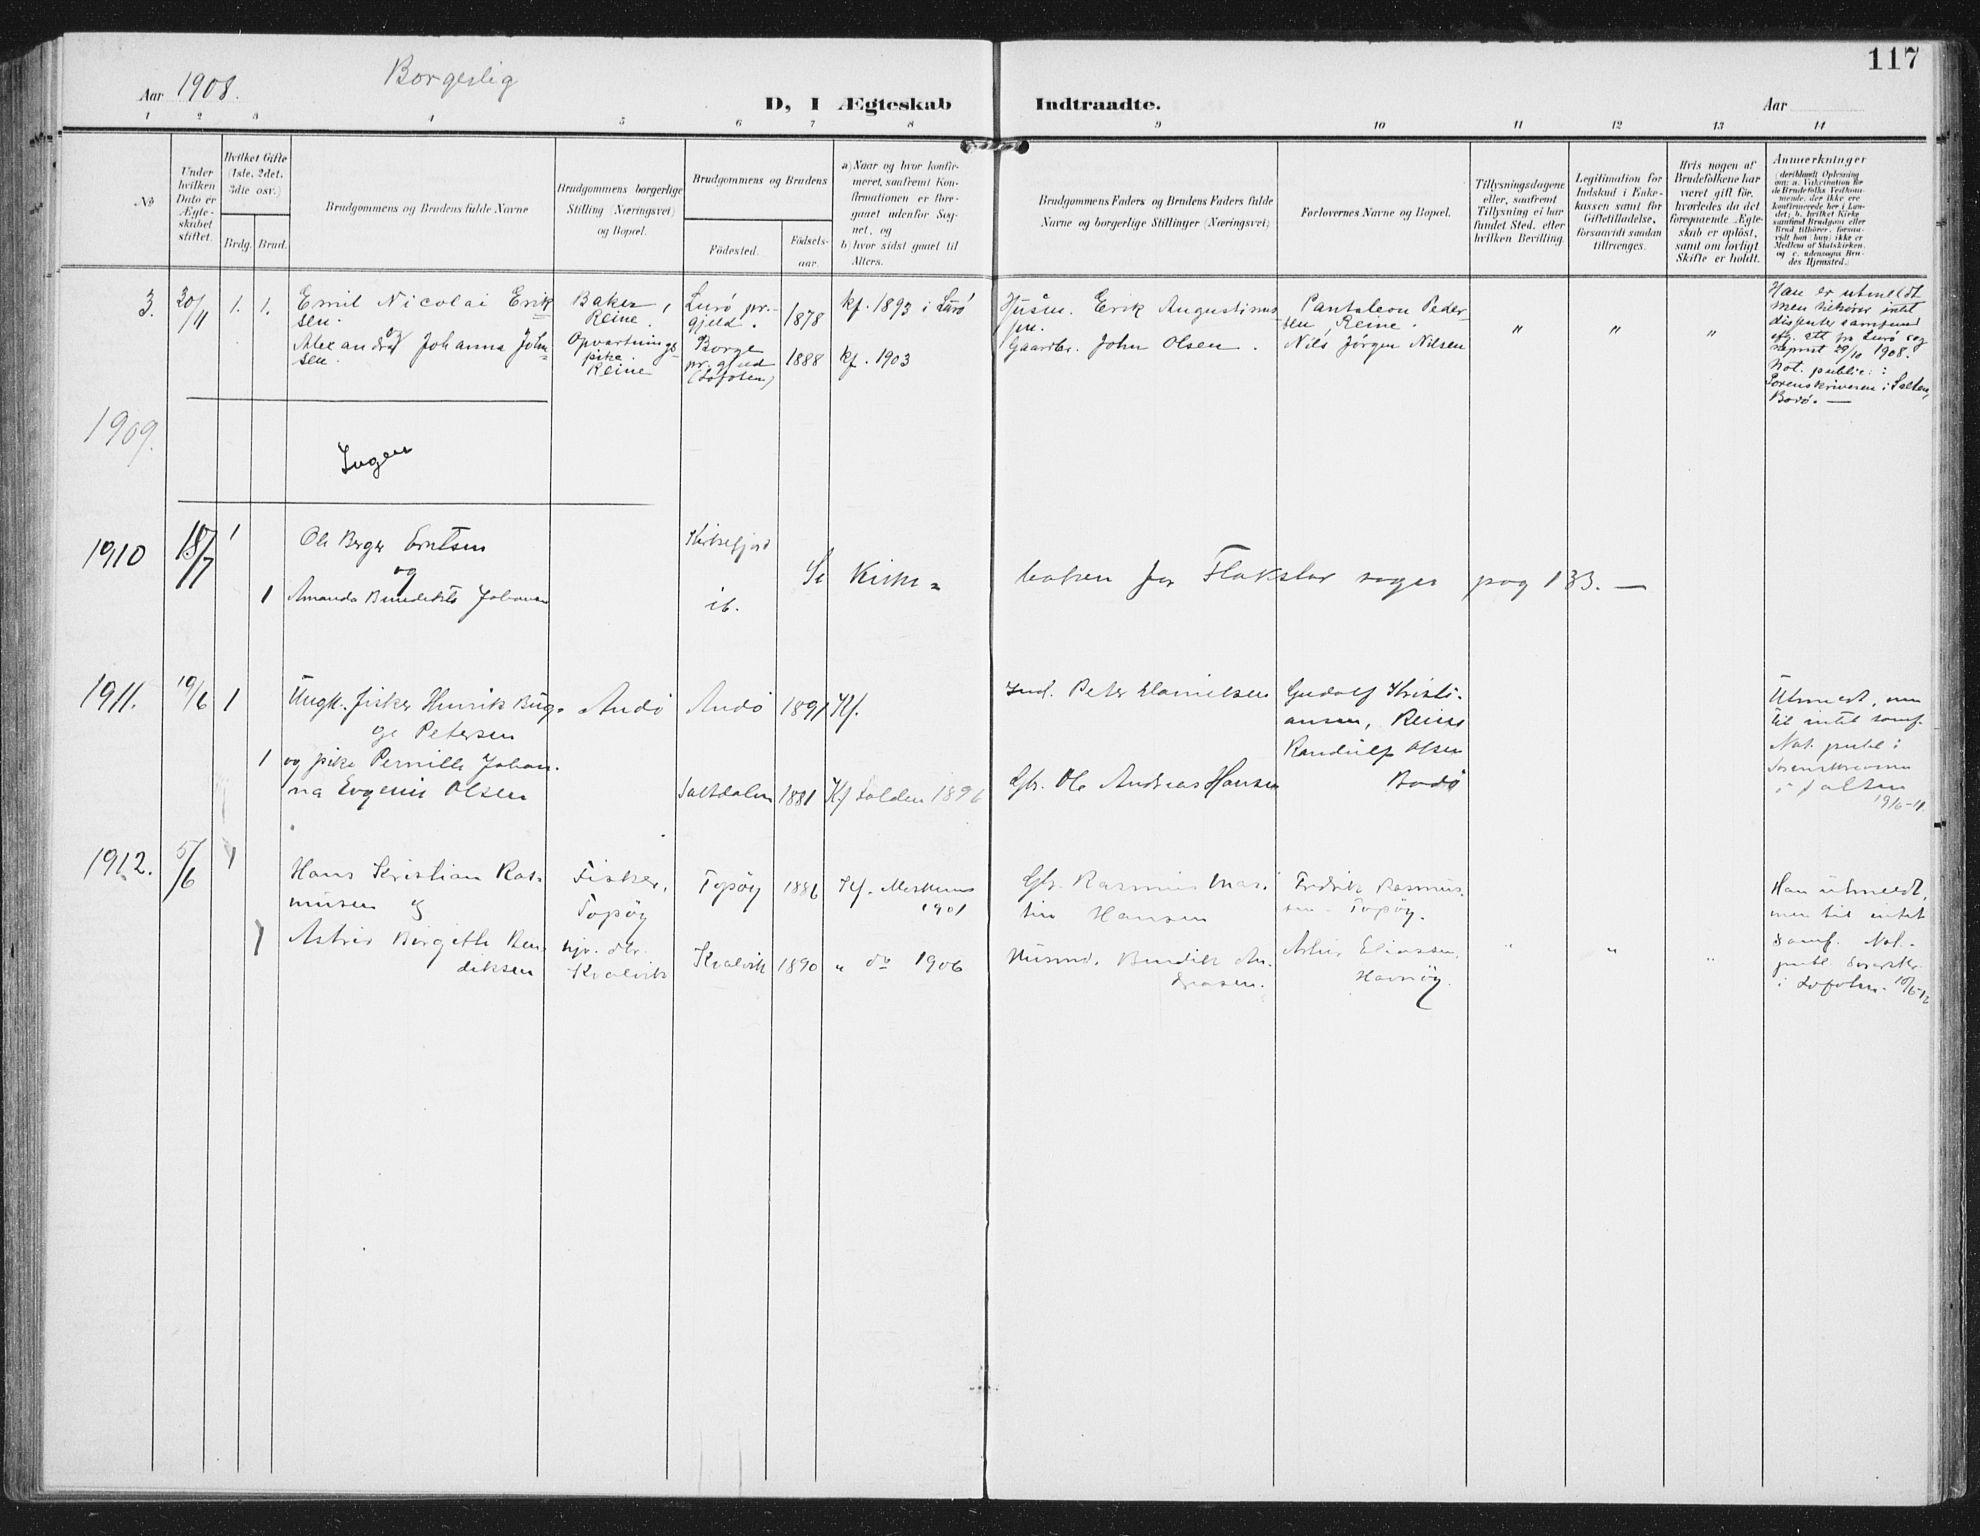 SAT, Ministerialprotokoller, klokkerbøker og fødselsregistre - Nordland, 886/L1221: Ministerialbok nr. 886A03, 1903-1913, s. 117